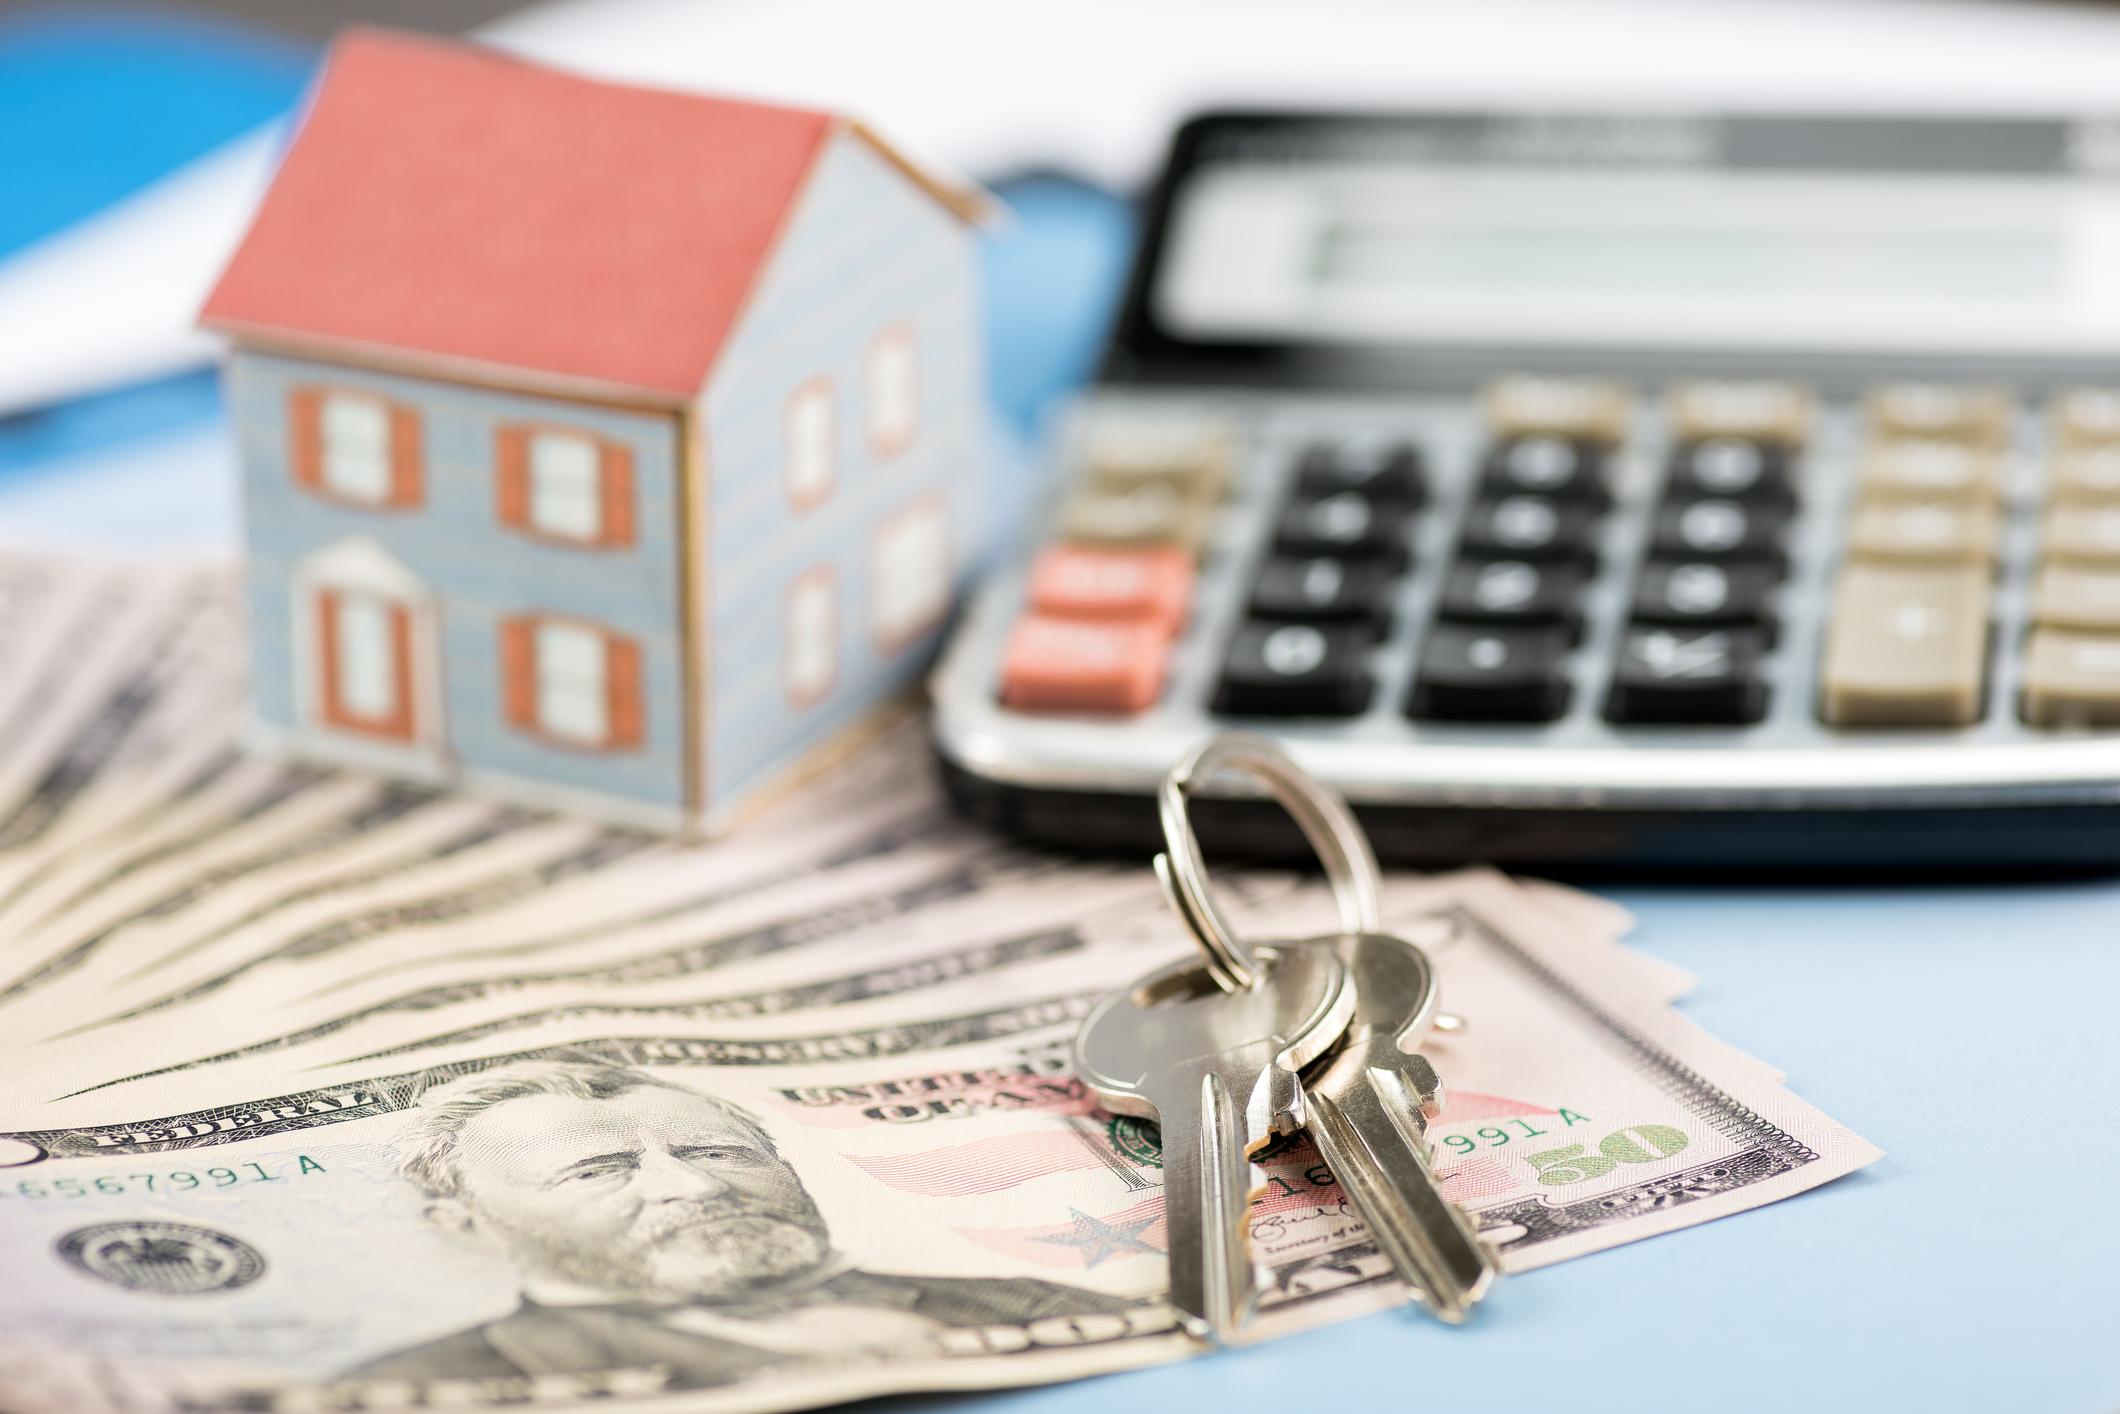 Calculator, miniature house, money, and keys.